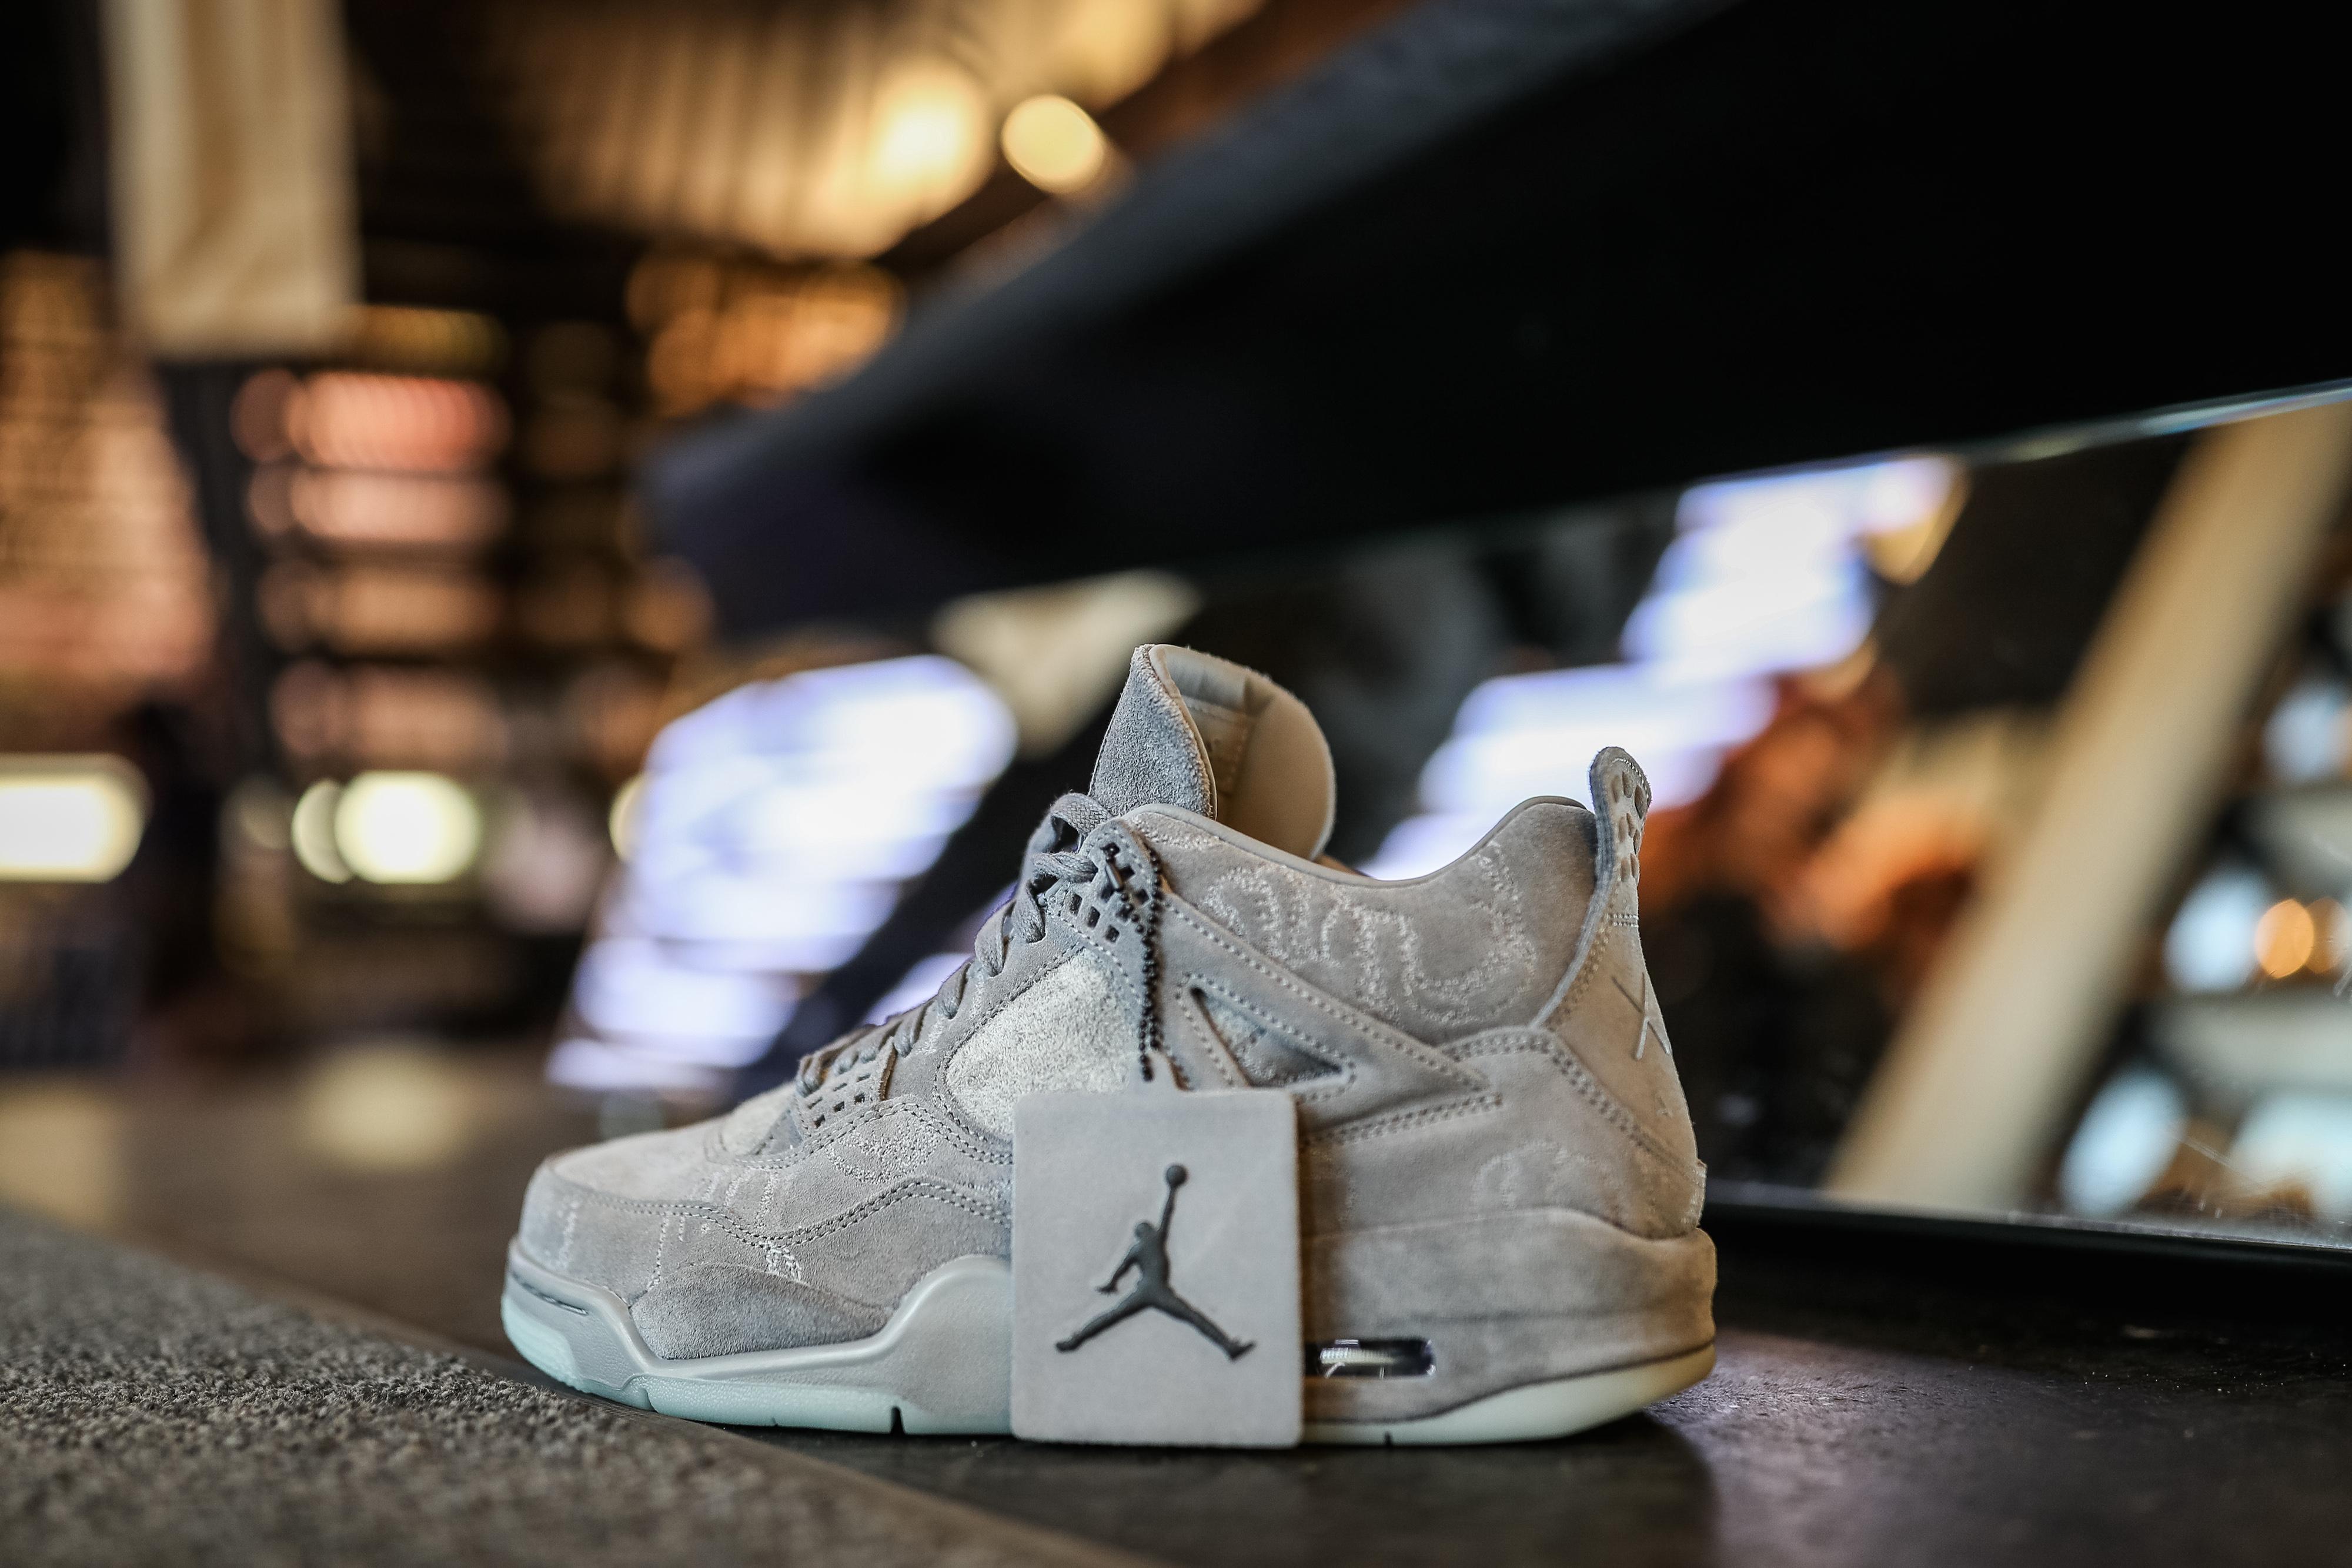 Chinese imitation of air jordan shoe brand countersues nike for kaws x air jordan iv sneakers at a sneakers store in berlin germany on march 31 2017 maja hitijgetty images buycottarizona Choice Image